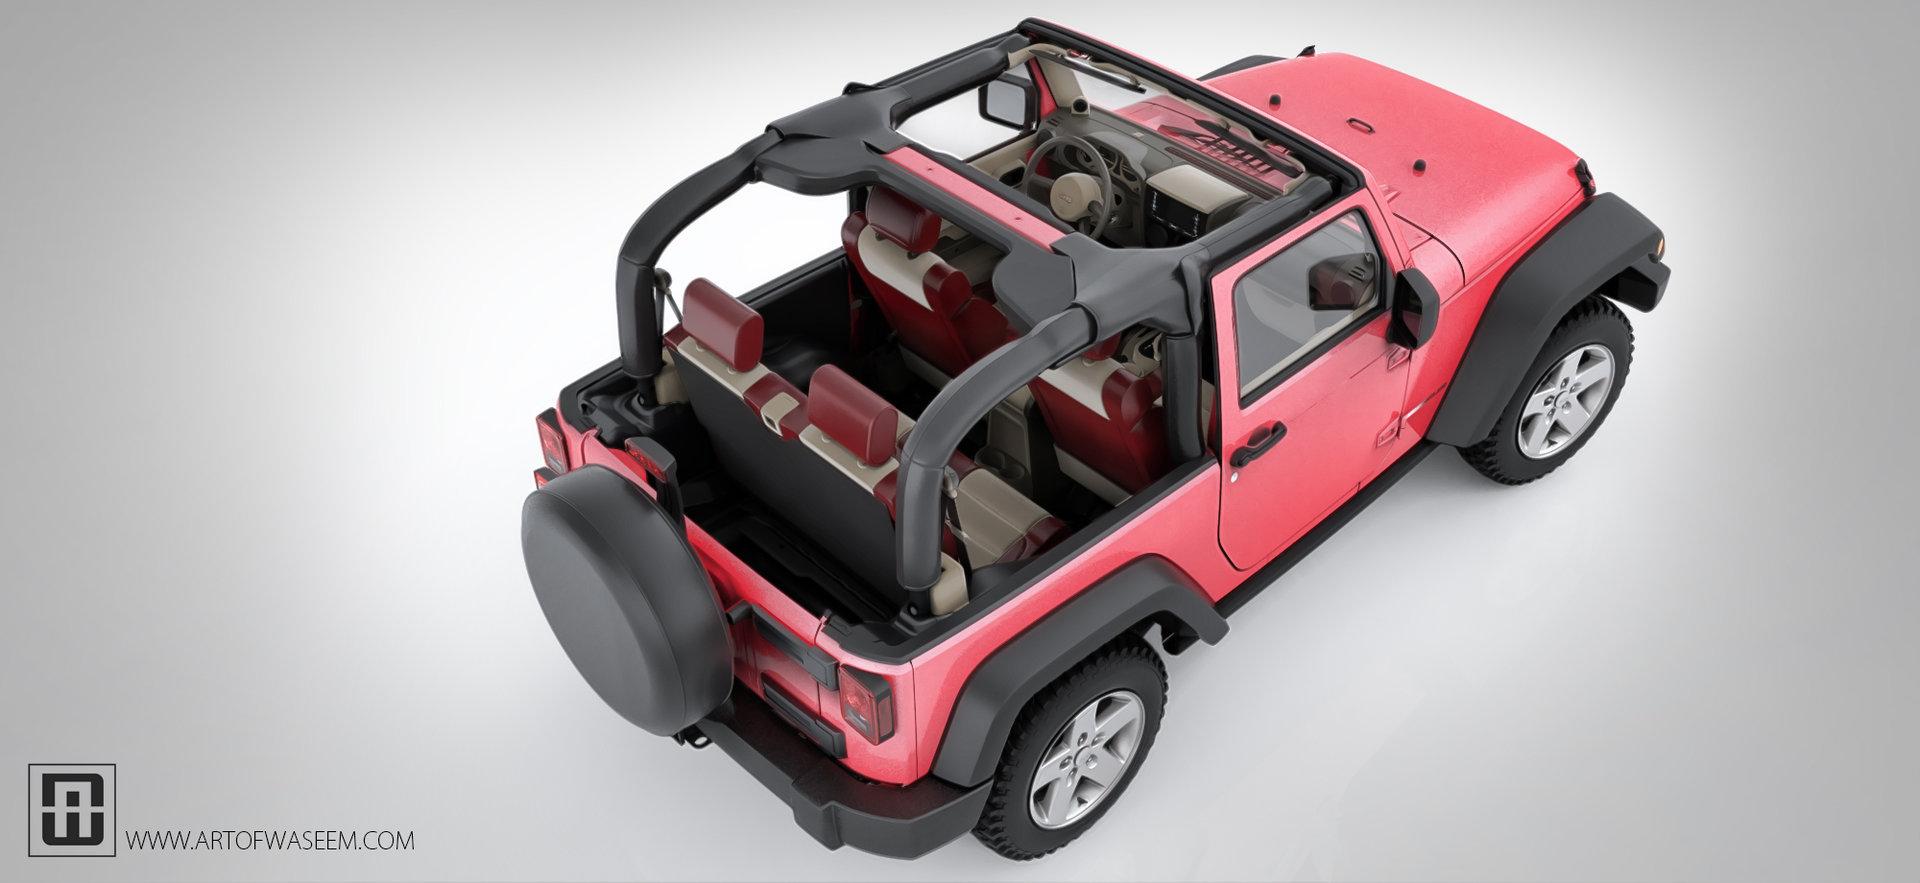 Muhammad waseem jeep wrangler 7 zps2a8c853a